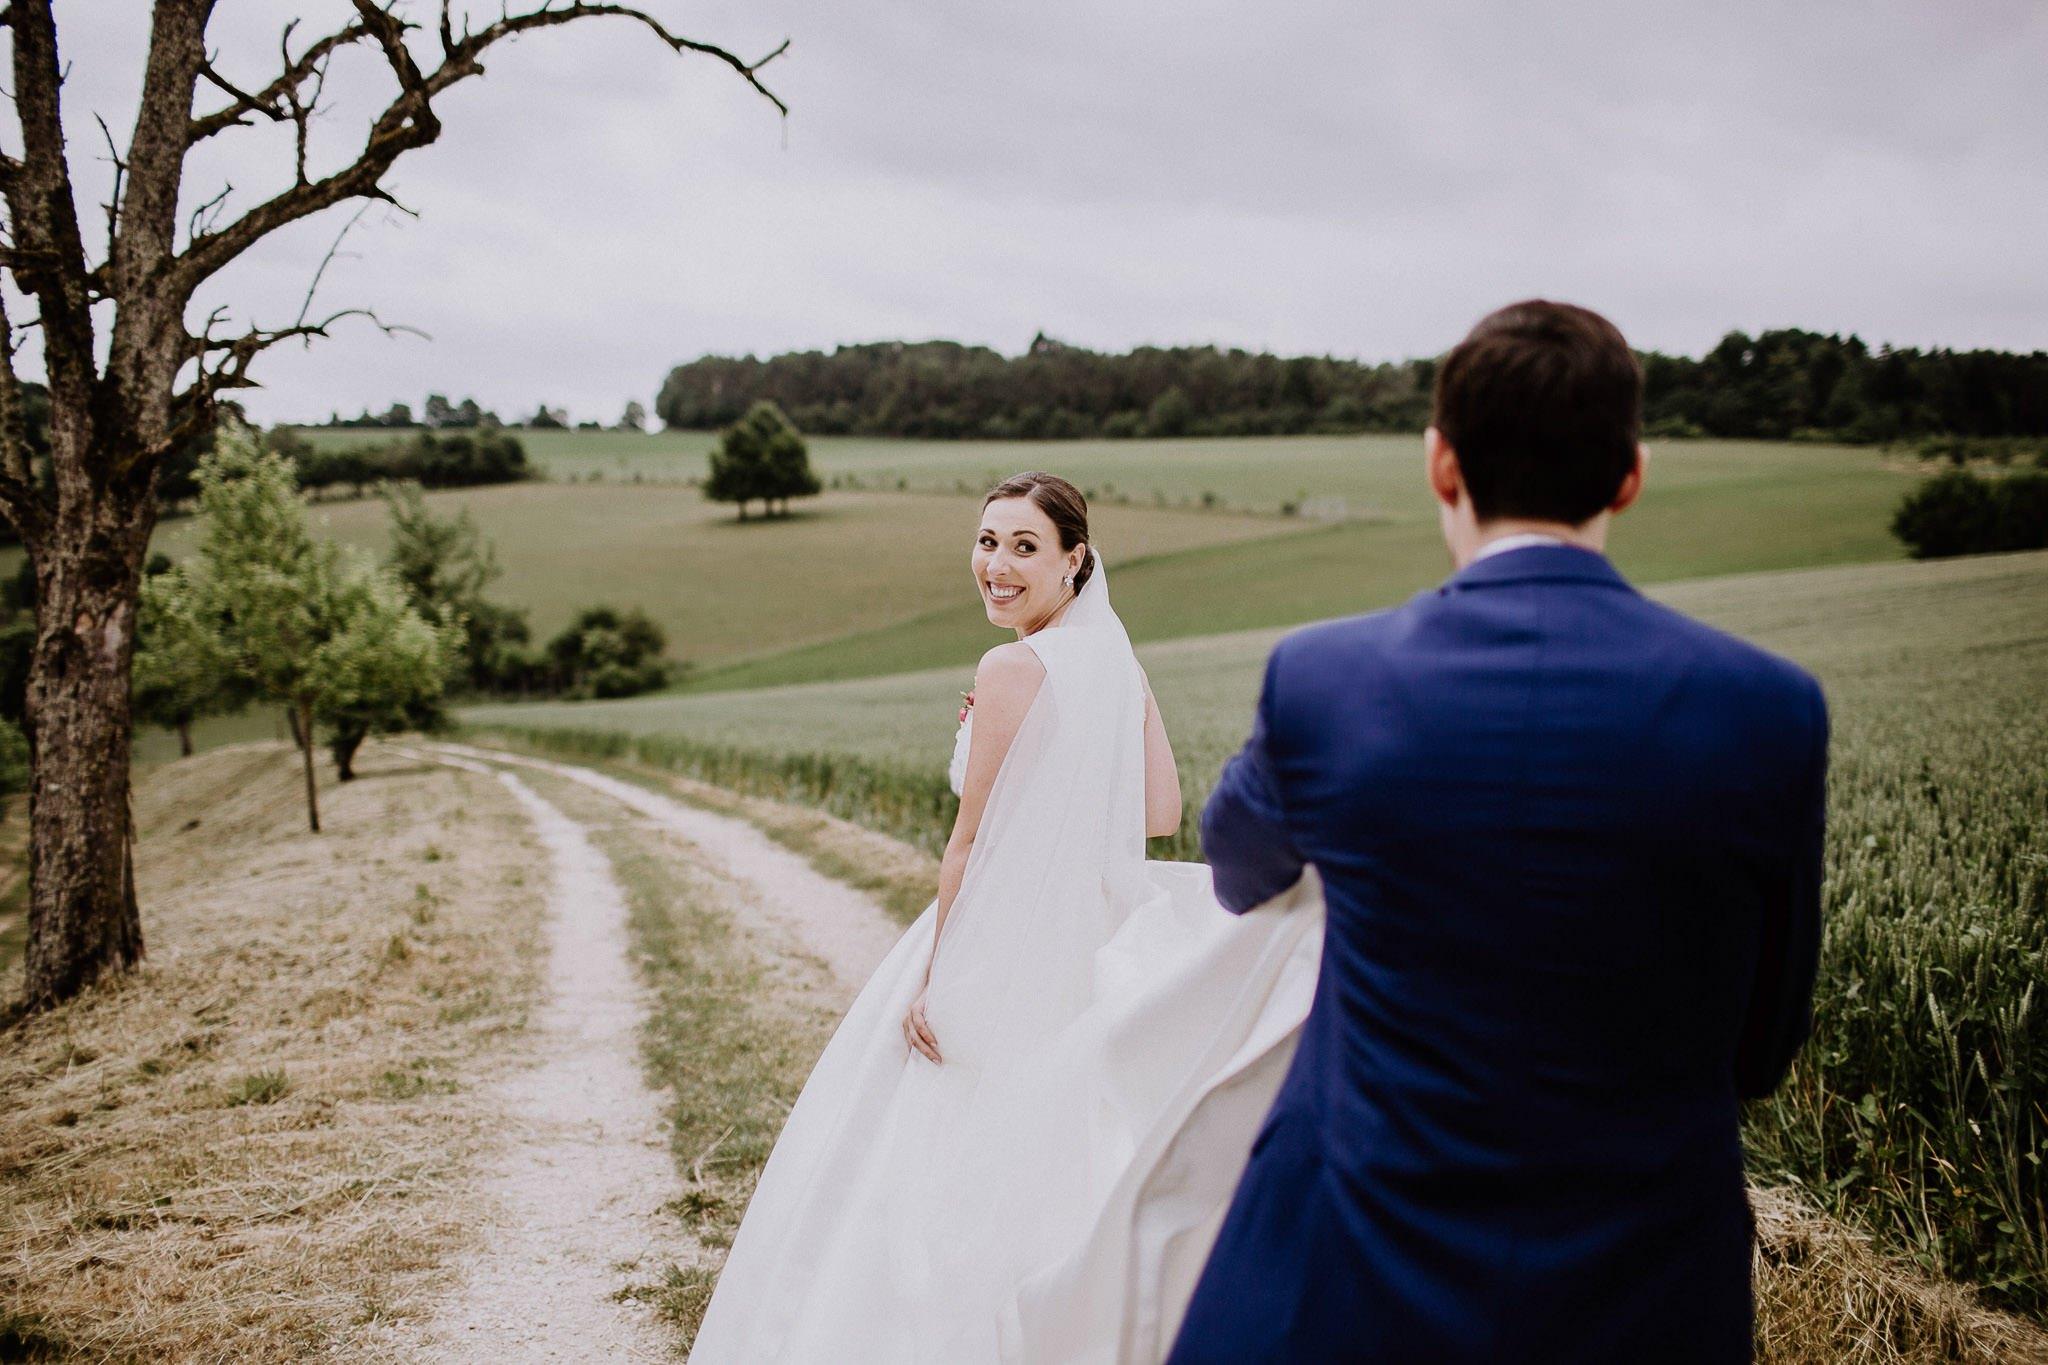 wedding photographer hamilton new zealand 1020 4